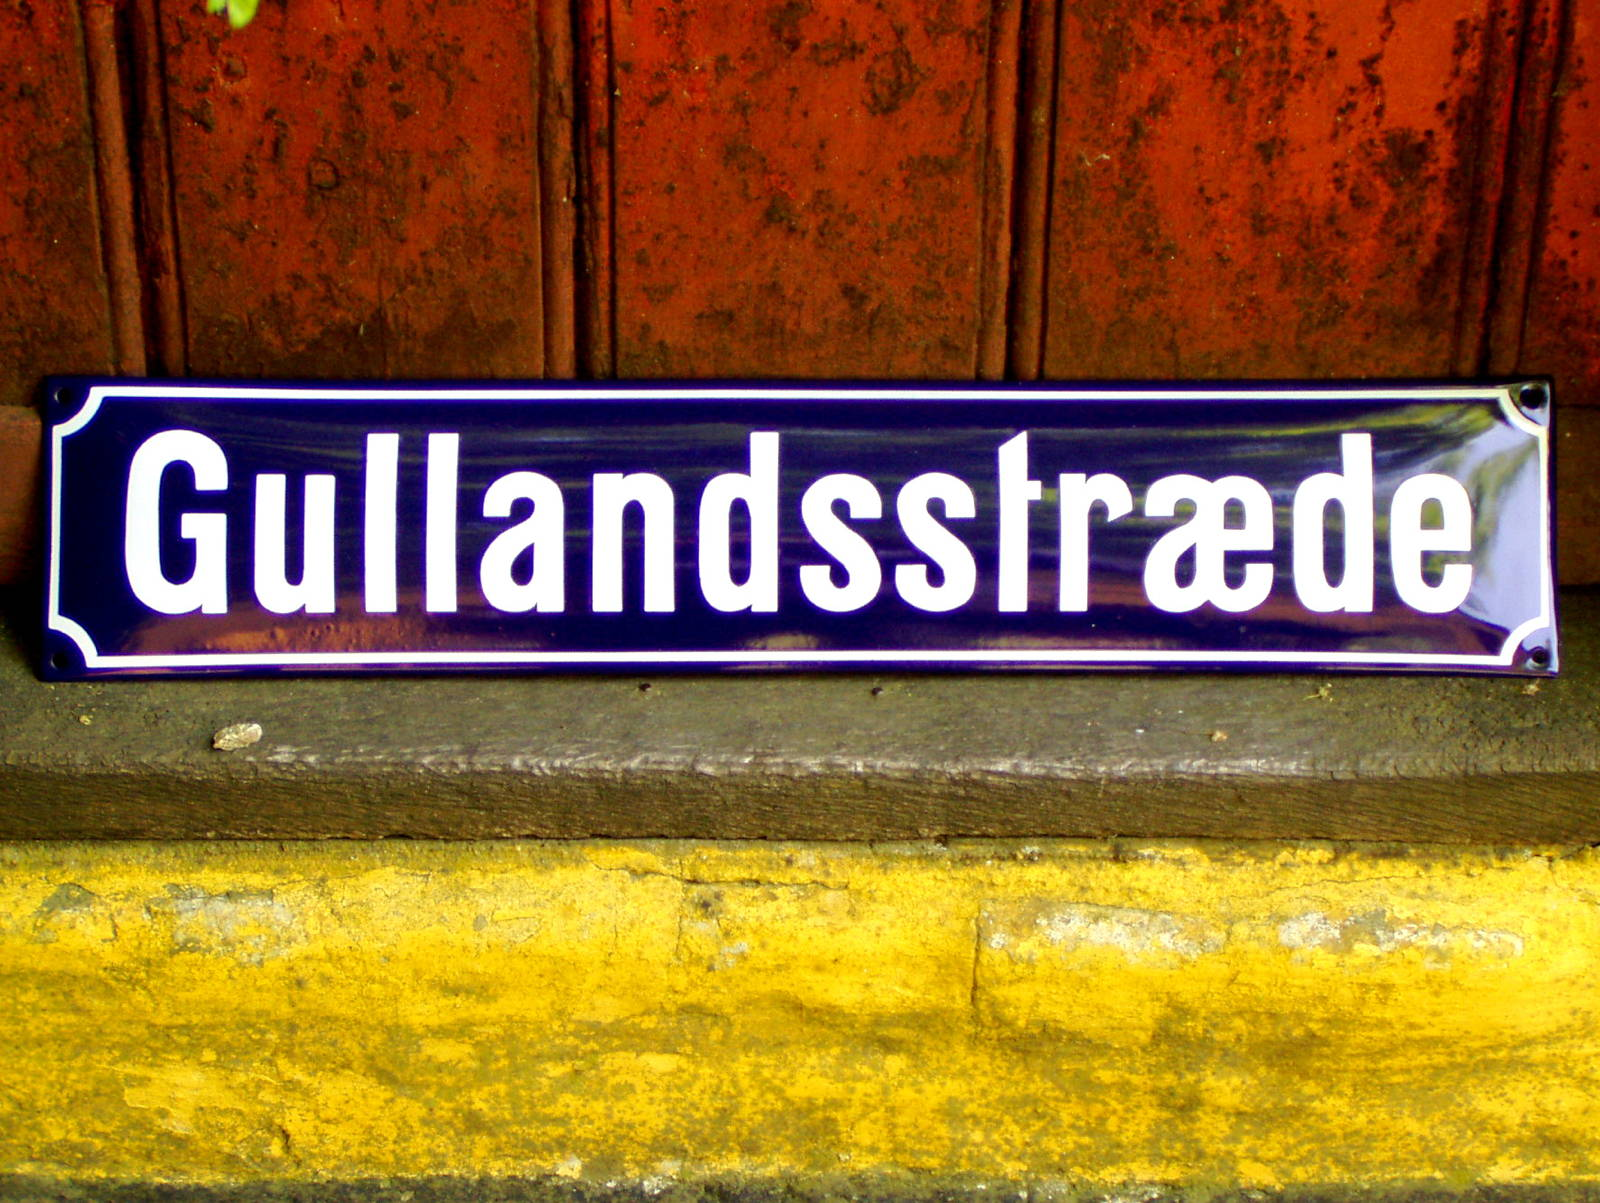 Gullandsstraede-web1600